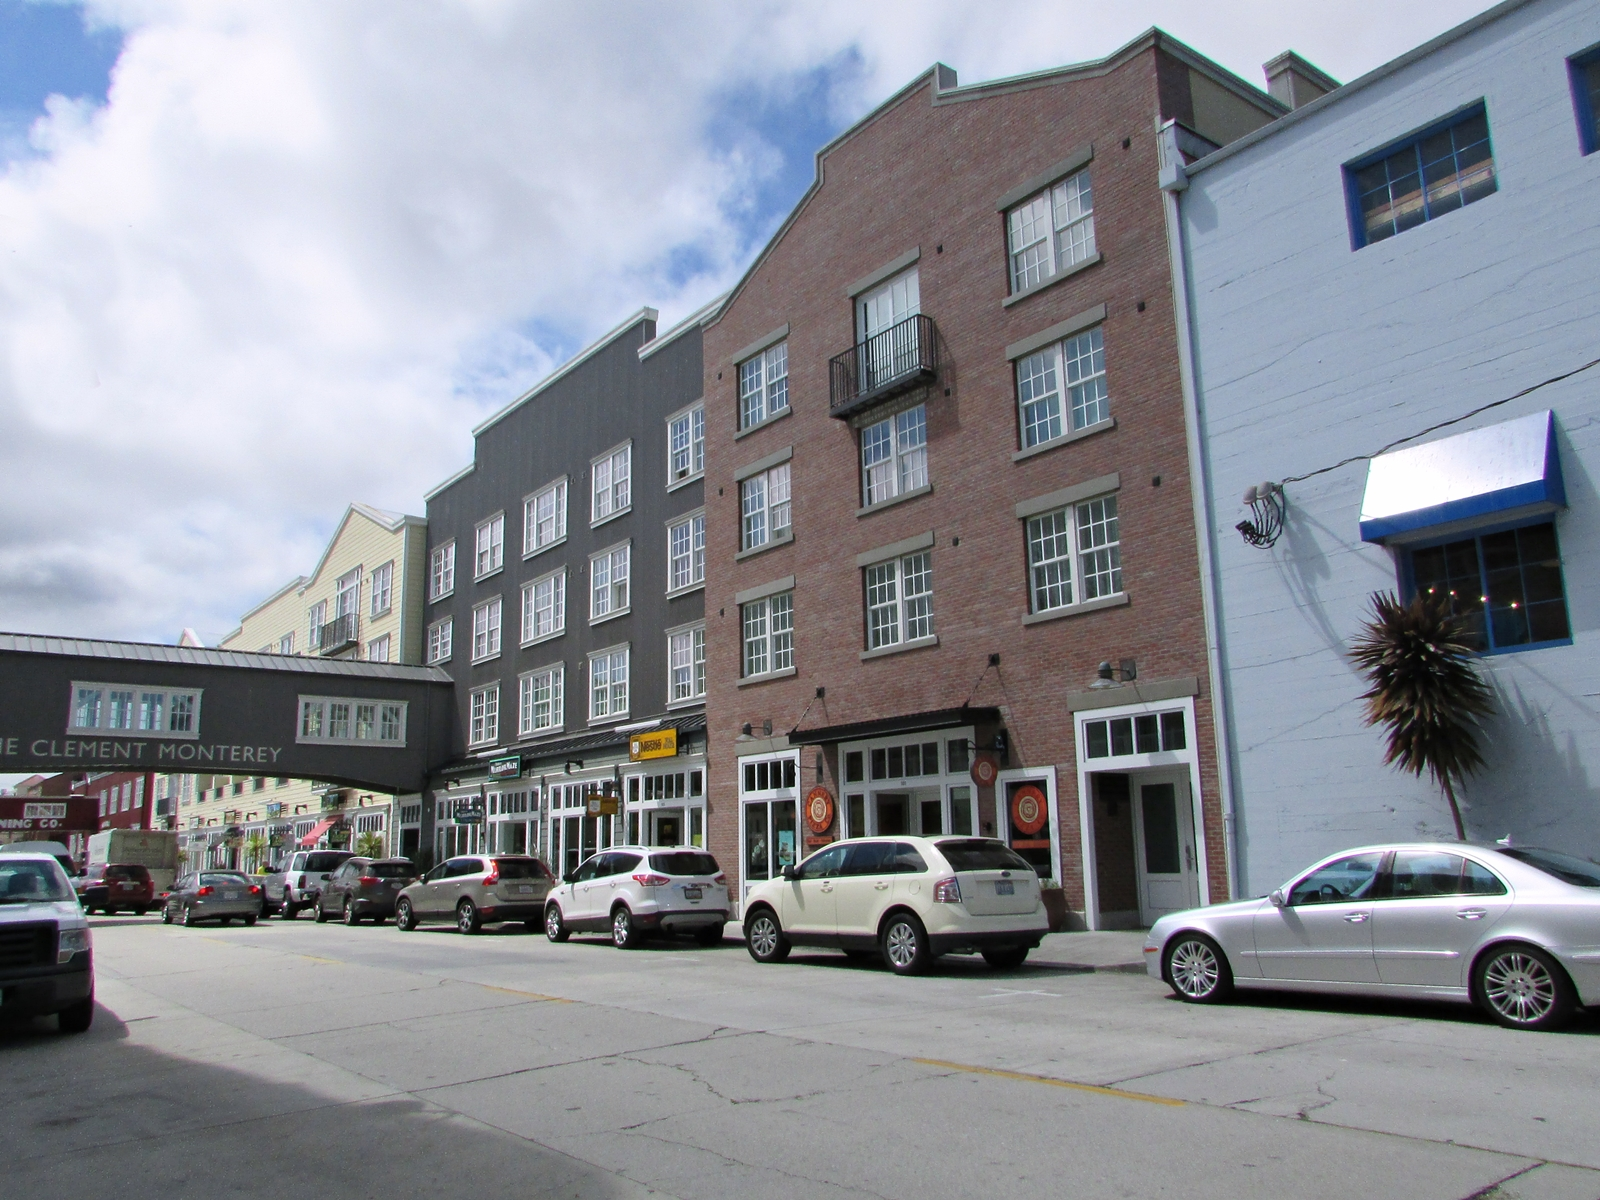 USA Rundreise - Amerika Westküste - Monterey - Fashionladyloves - Travelblog - Reise Blog